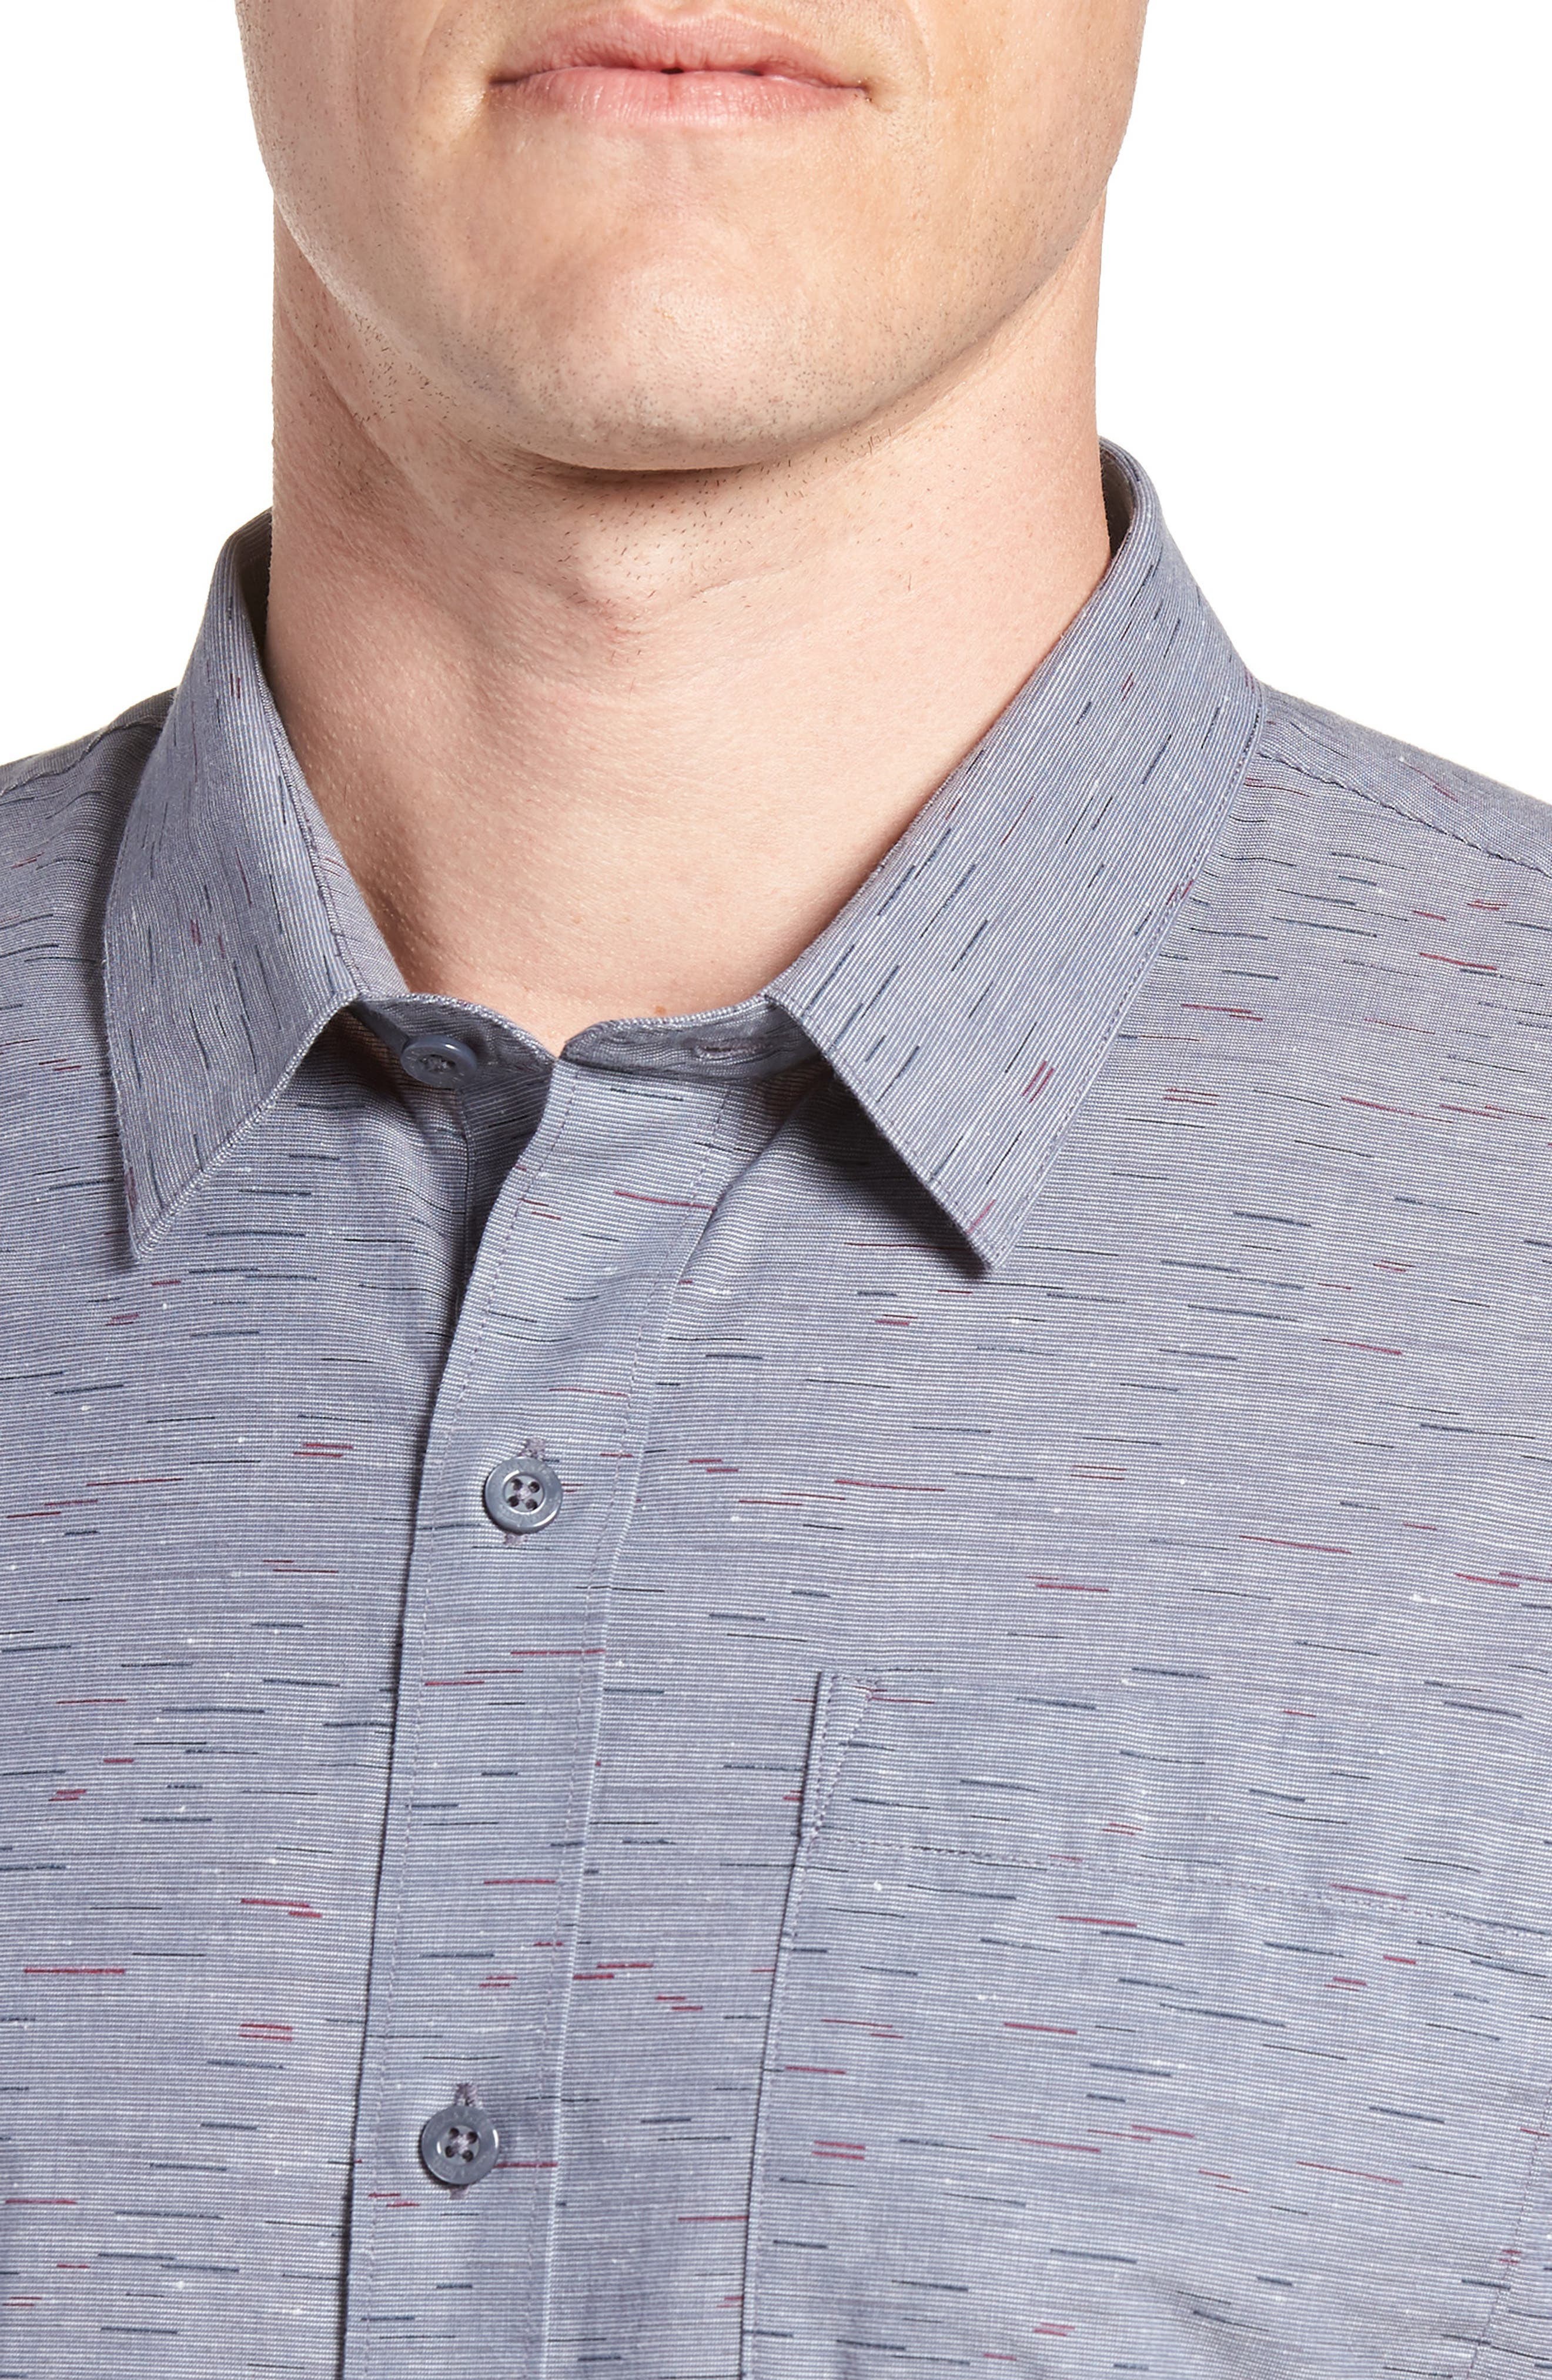 Stacoto Regular Fit Sport Shirt,                             Alternate thumbnail 2, color,                             Heather Alloy